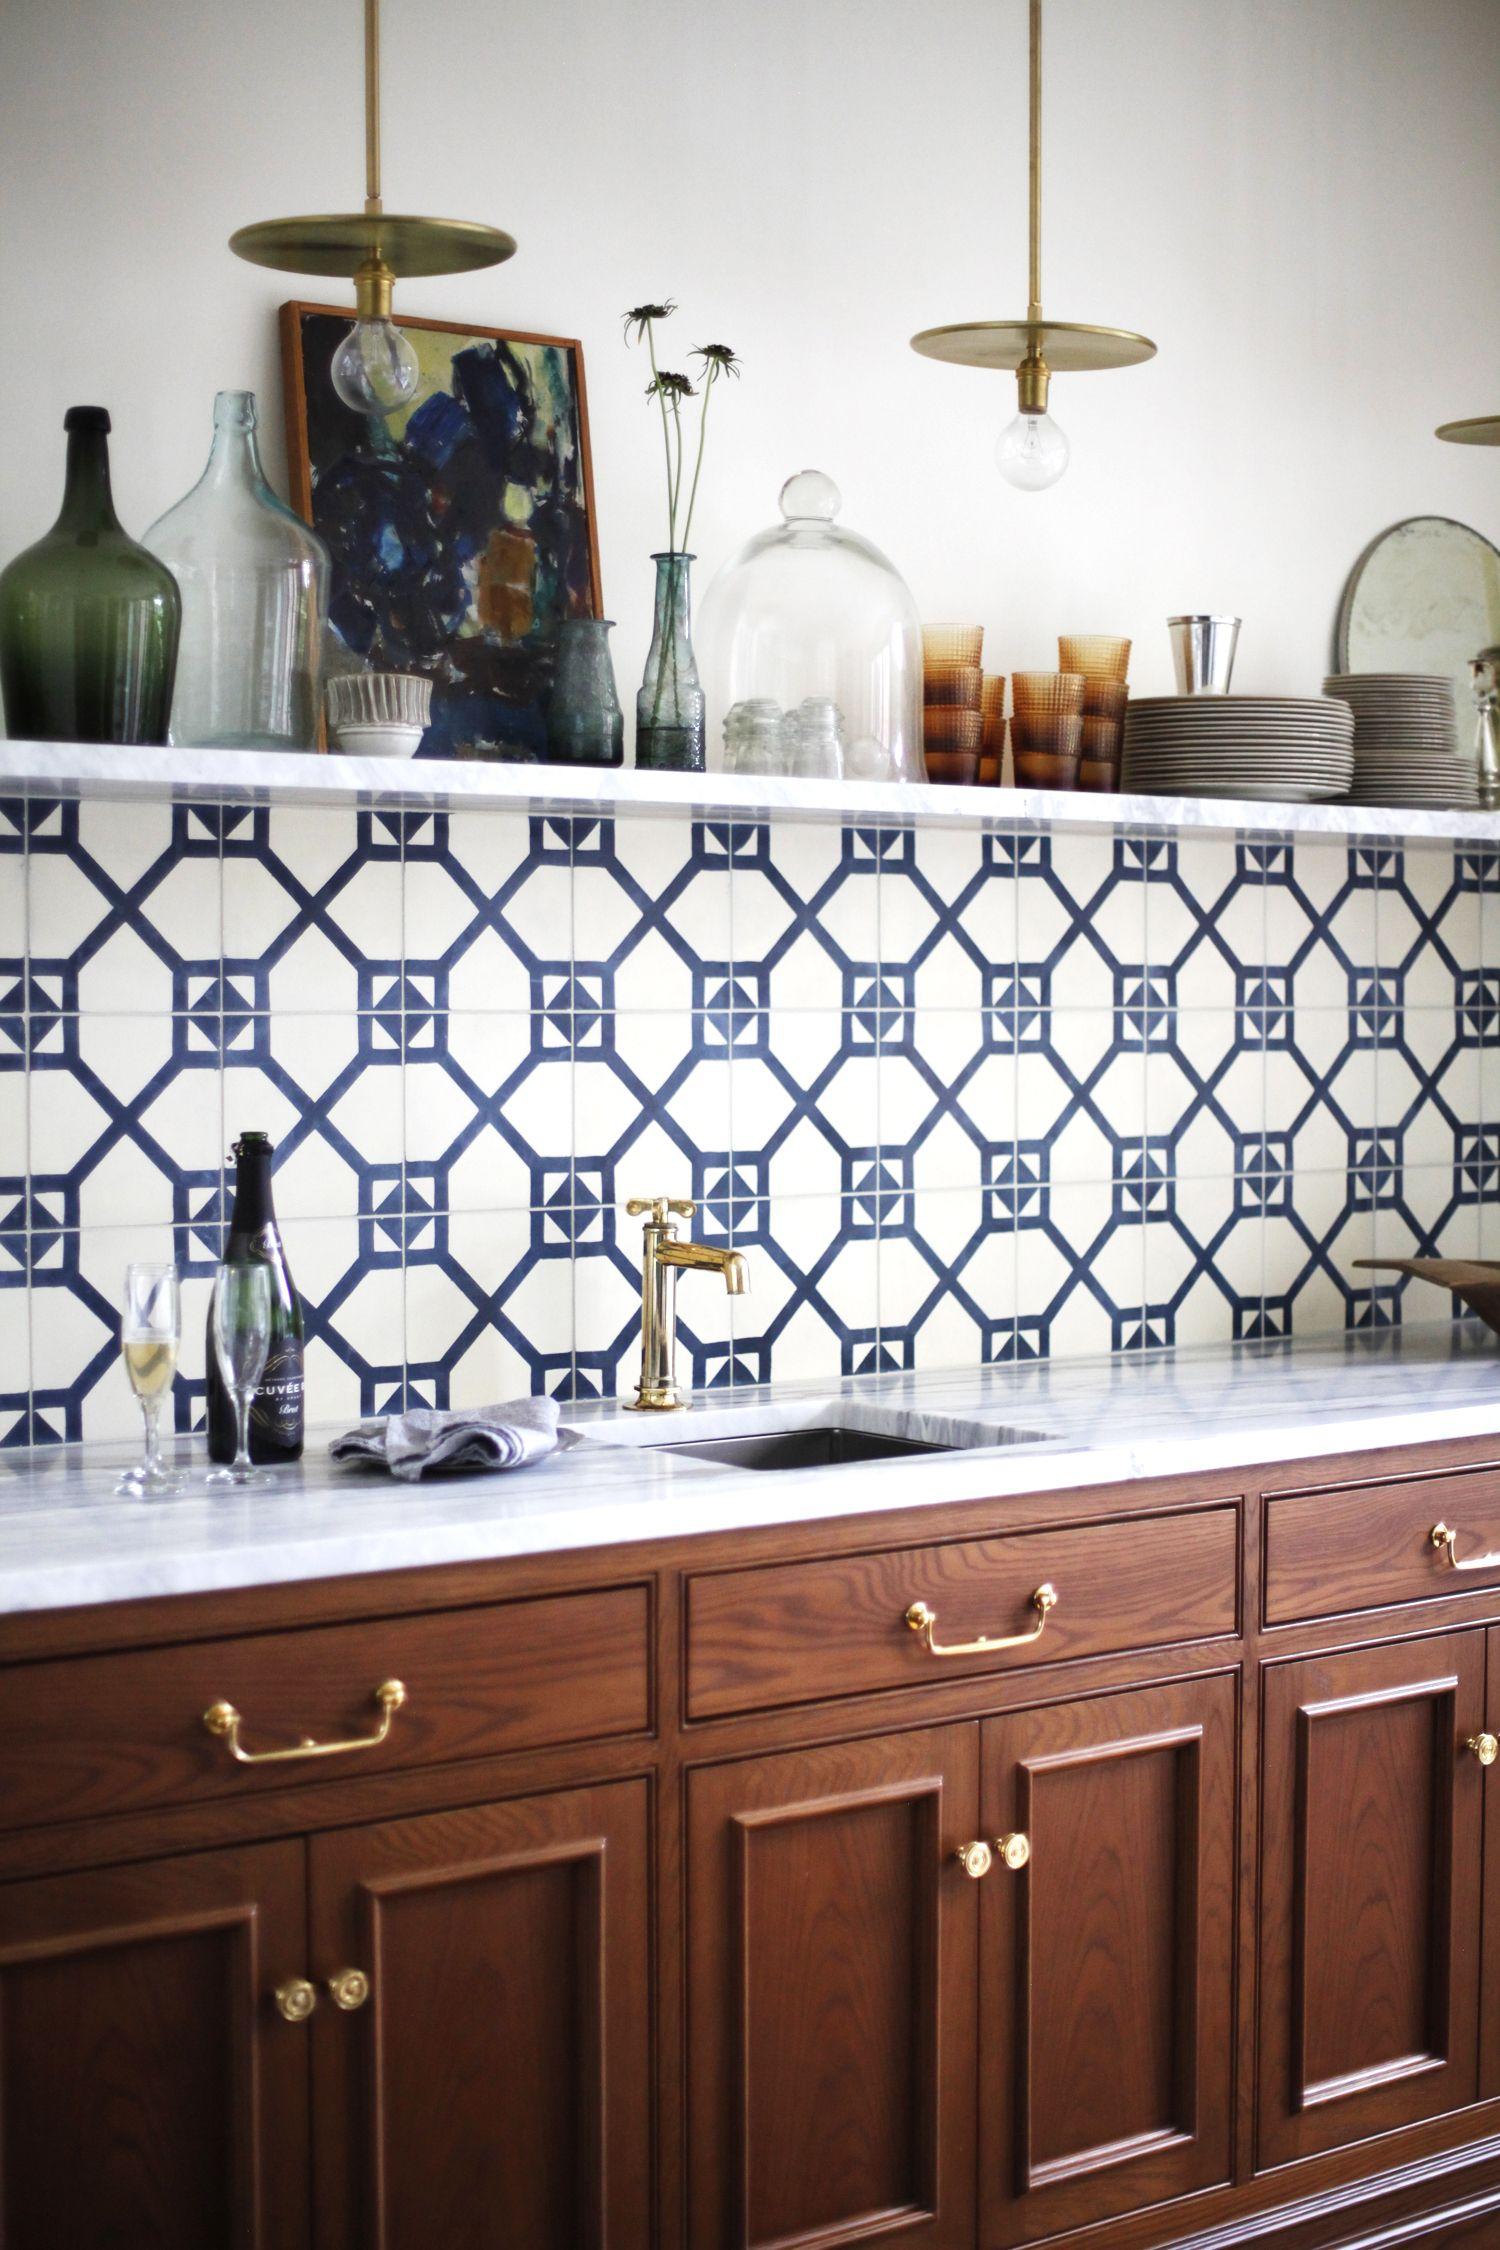 - Blue Patterned Tile Backsplash With Single Marble Open Shelf